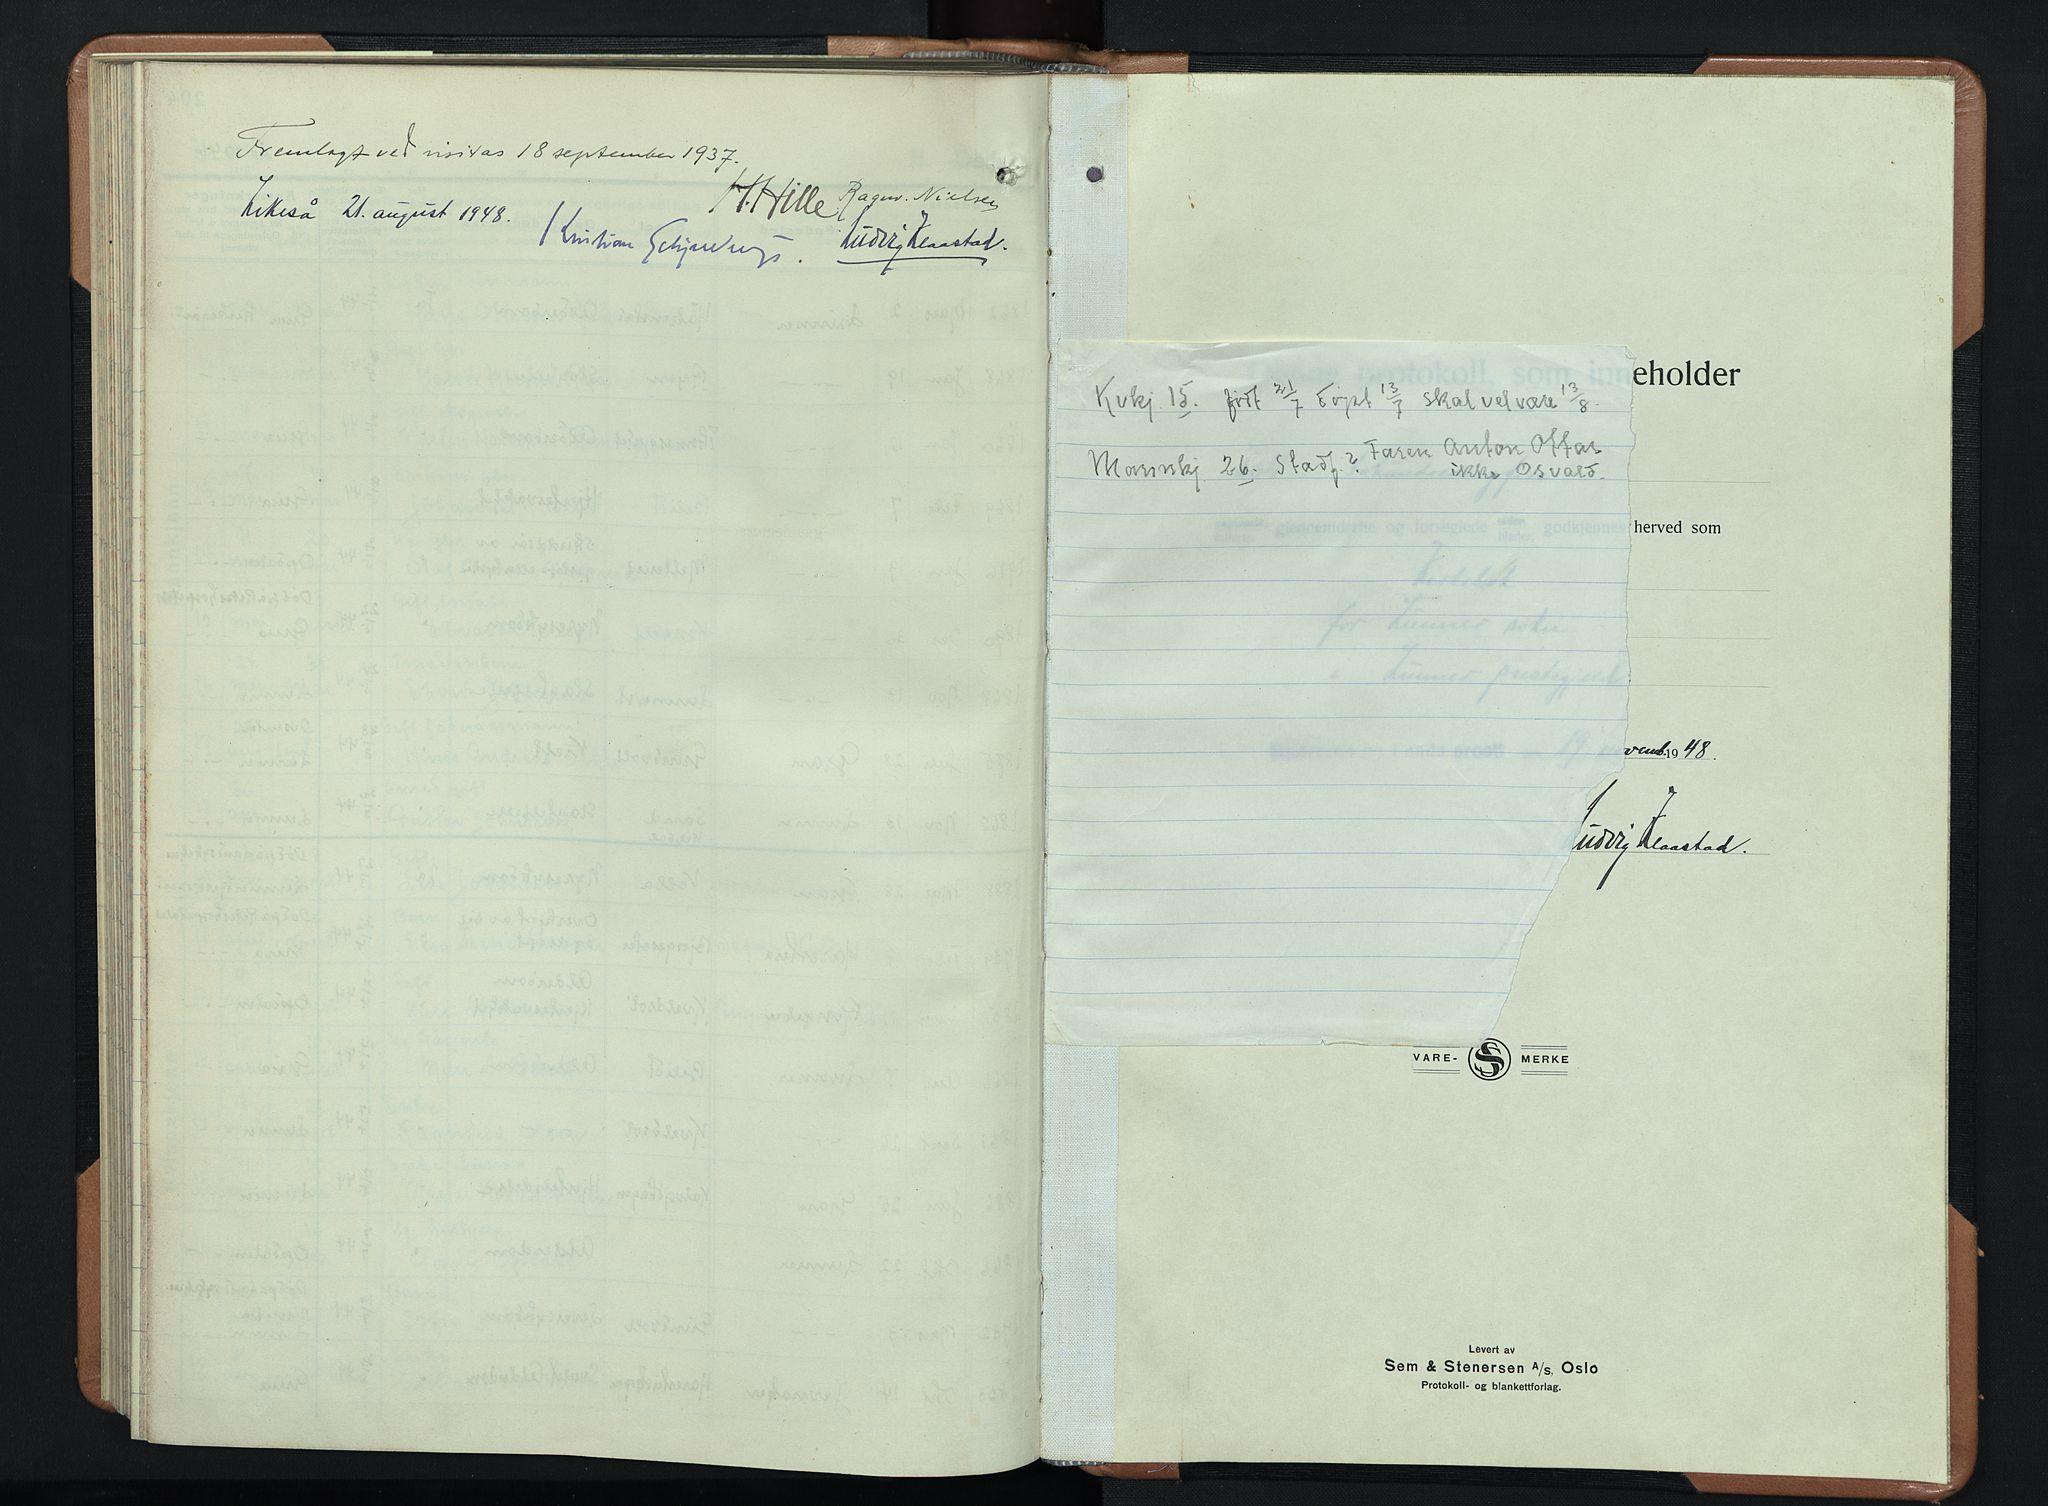 SAH, Lunner prestekontor, H/Ha/Hab/L0003: Klokkerbok nr. 3, 1933-1945